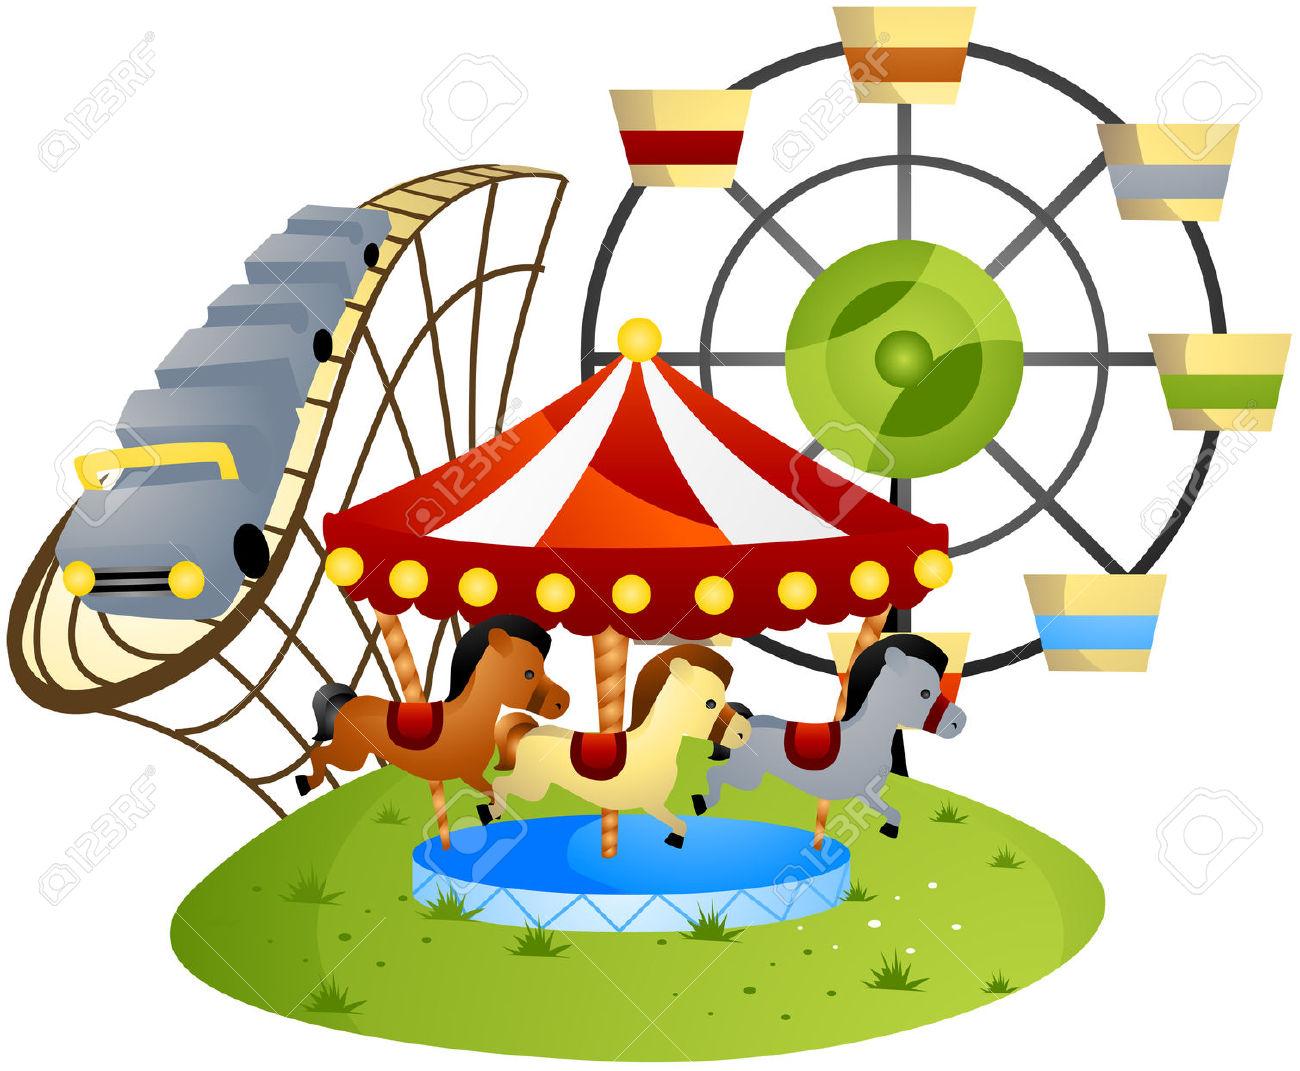 Amusement Park Cartoon With .-Amusement Park Cartoon with .-1